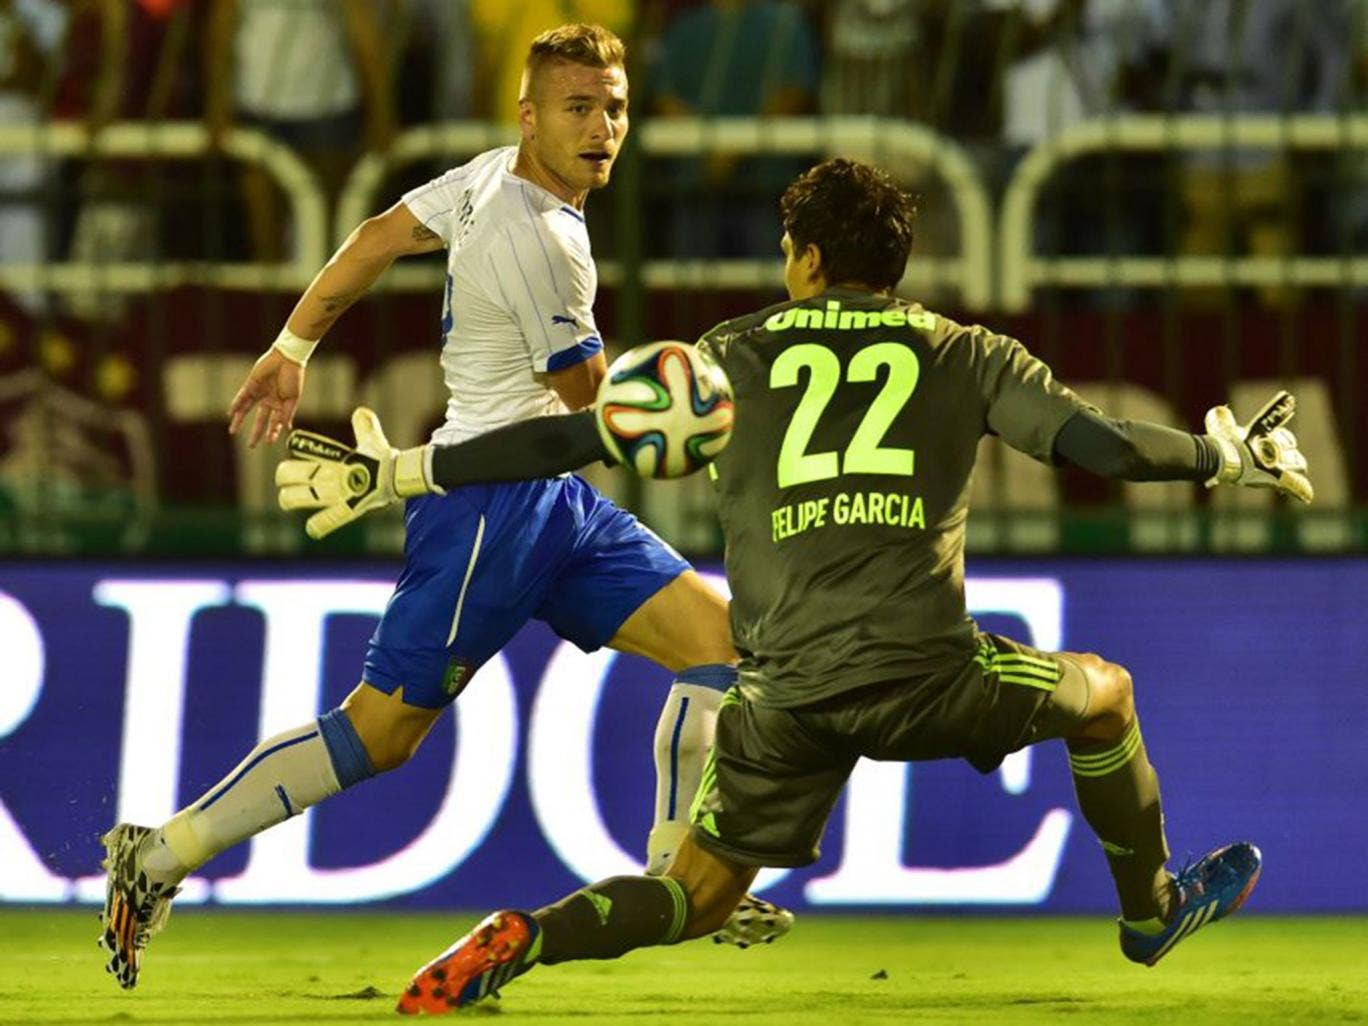 Ciro Immobile beats Fluminense keeper Felipe Garcia dos Prazeres to score one of his hat-trick